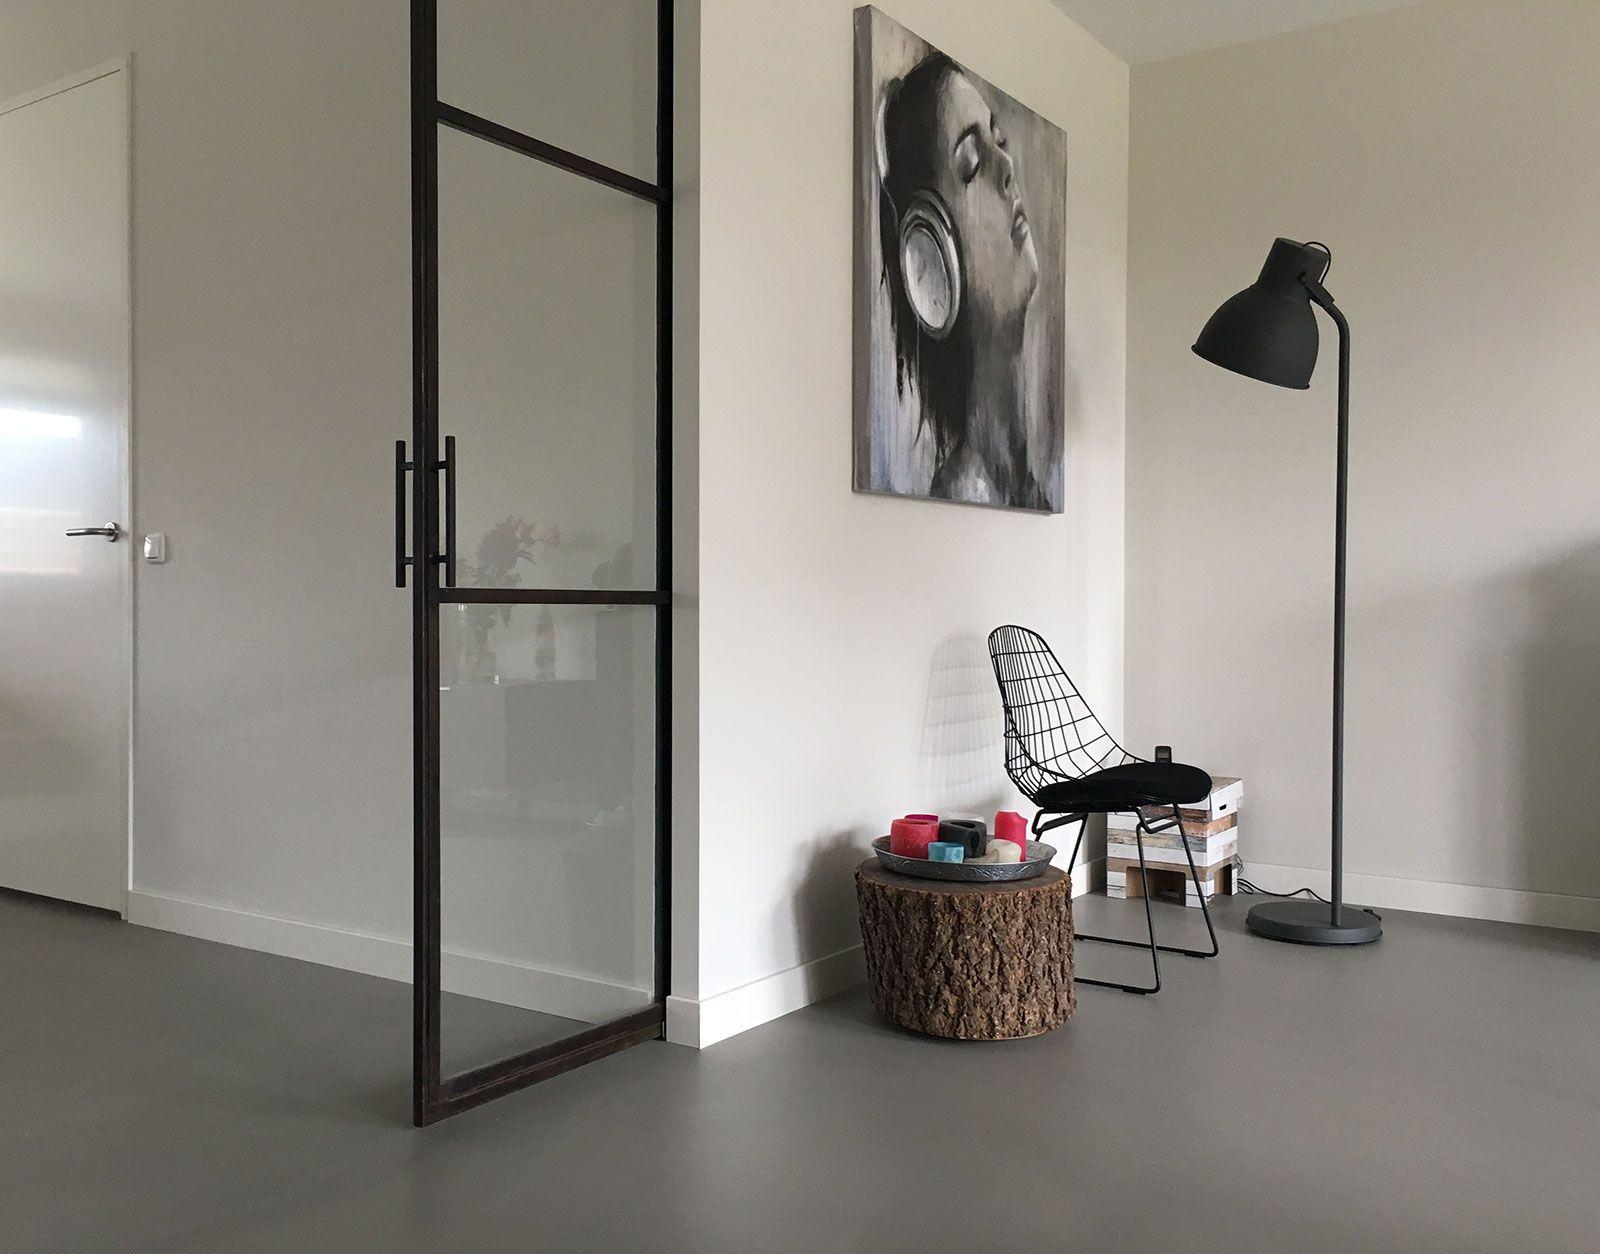 Gietvloer In Woonkamer : Afbeeldingsresultaat voor gietvloer woonkamer lucas oebele in